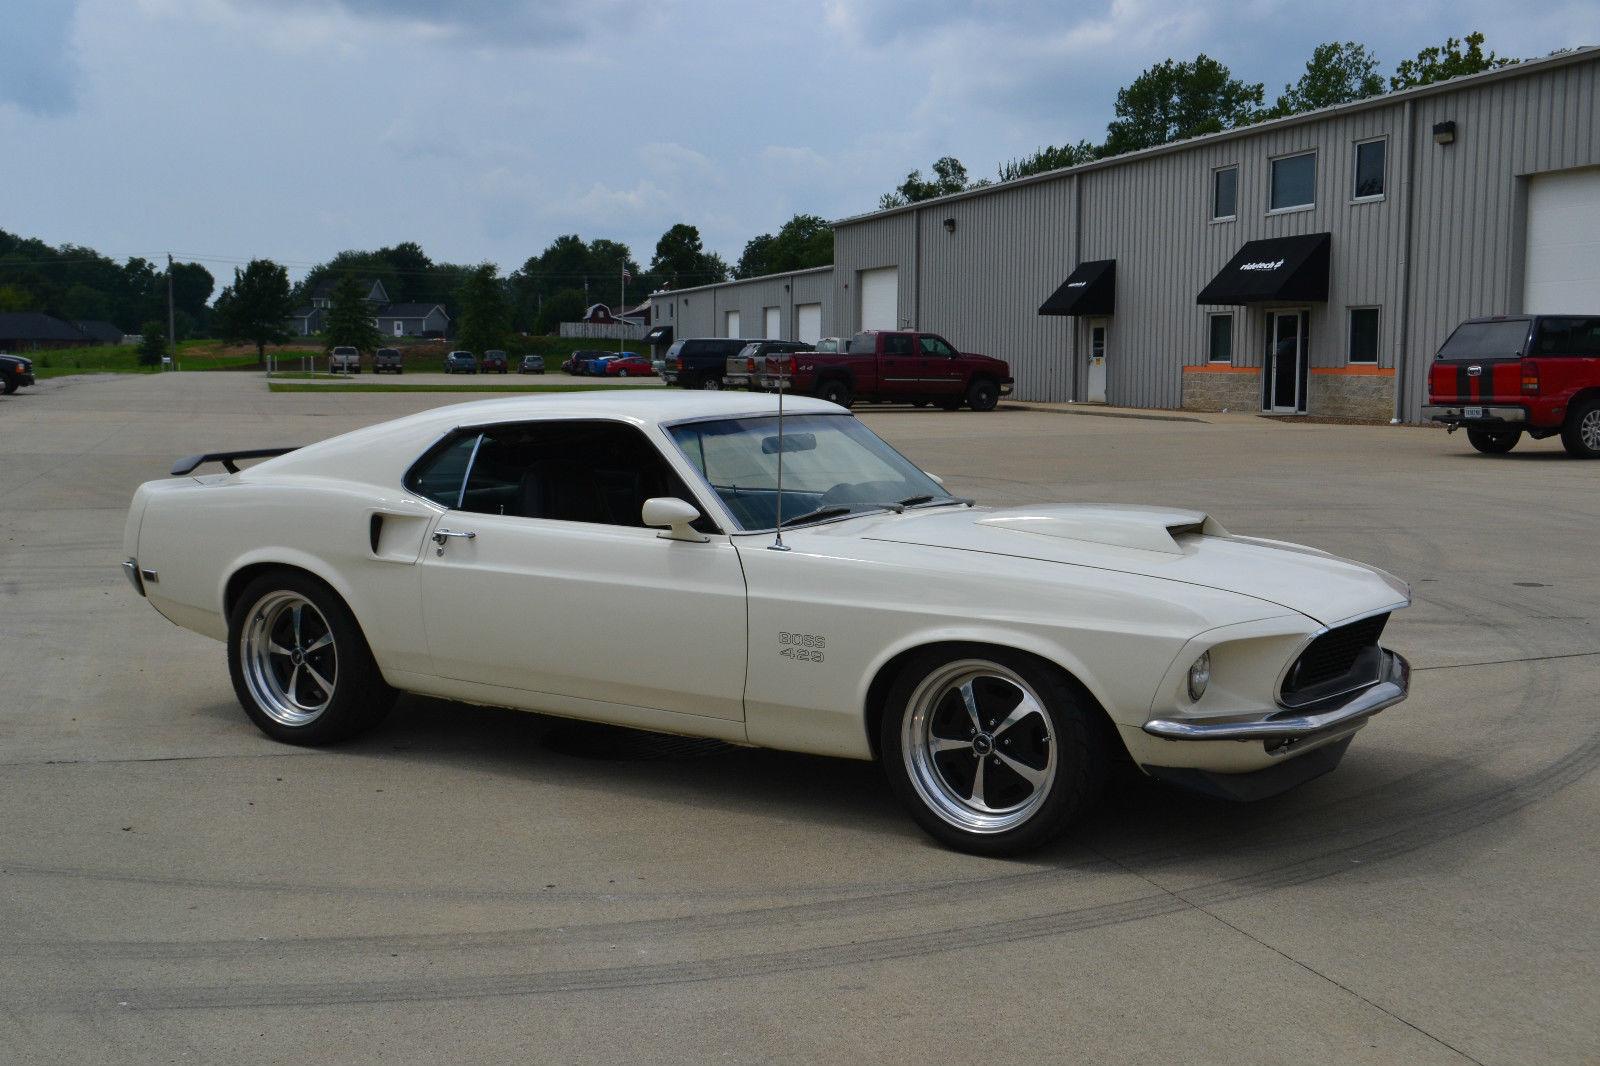 1969 Boss 429 Ford Mustang Kk1634 Classic For Sale